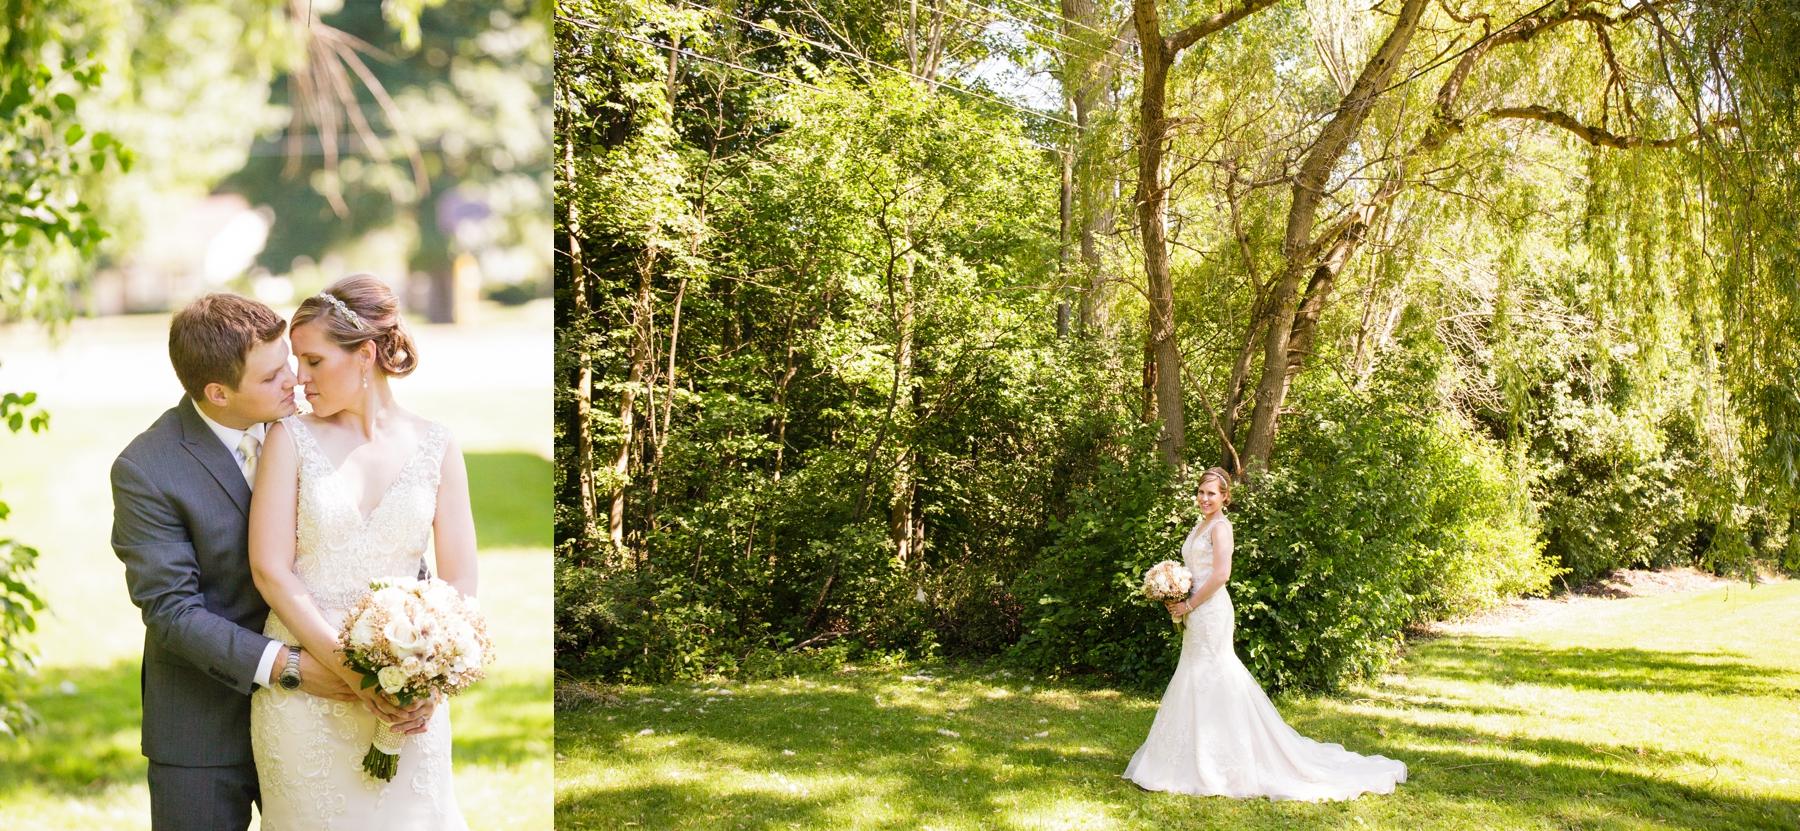 Ben_Jillian_Midland_Baycity_Wedding_0053.jpg